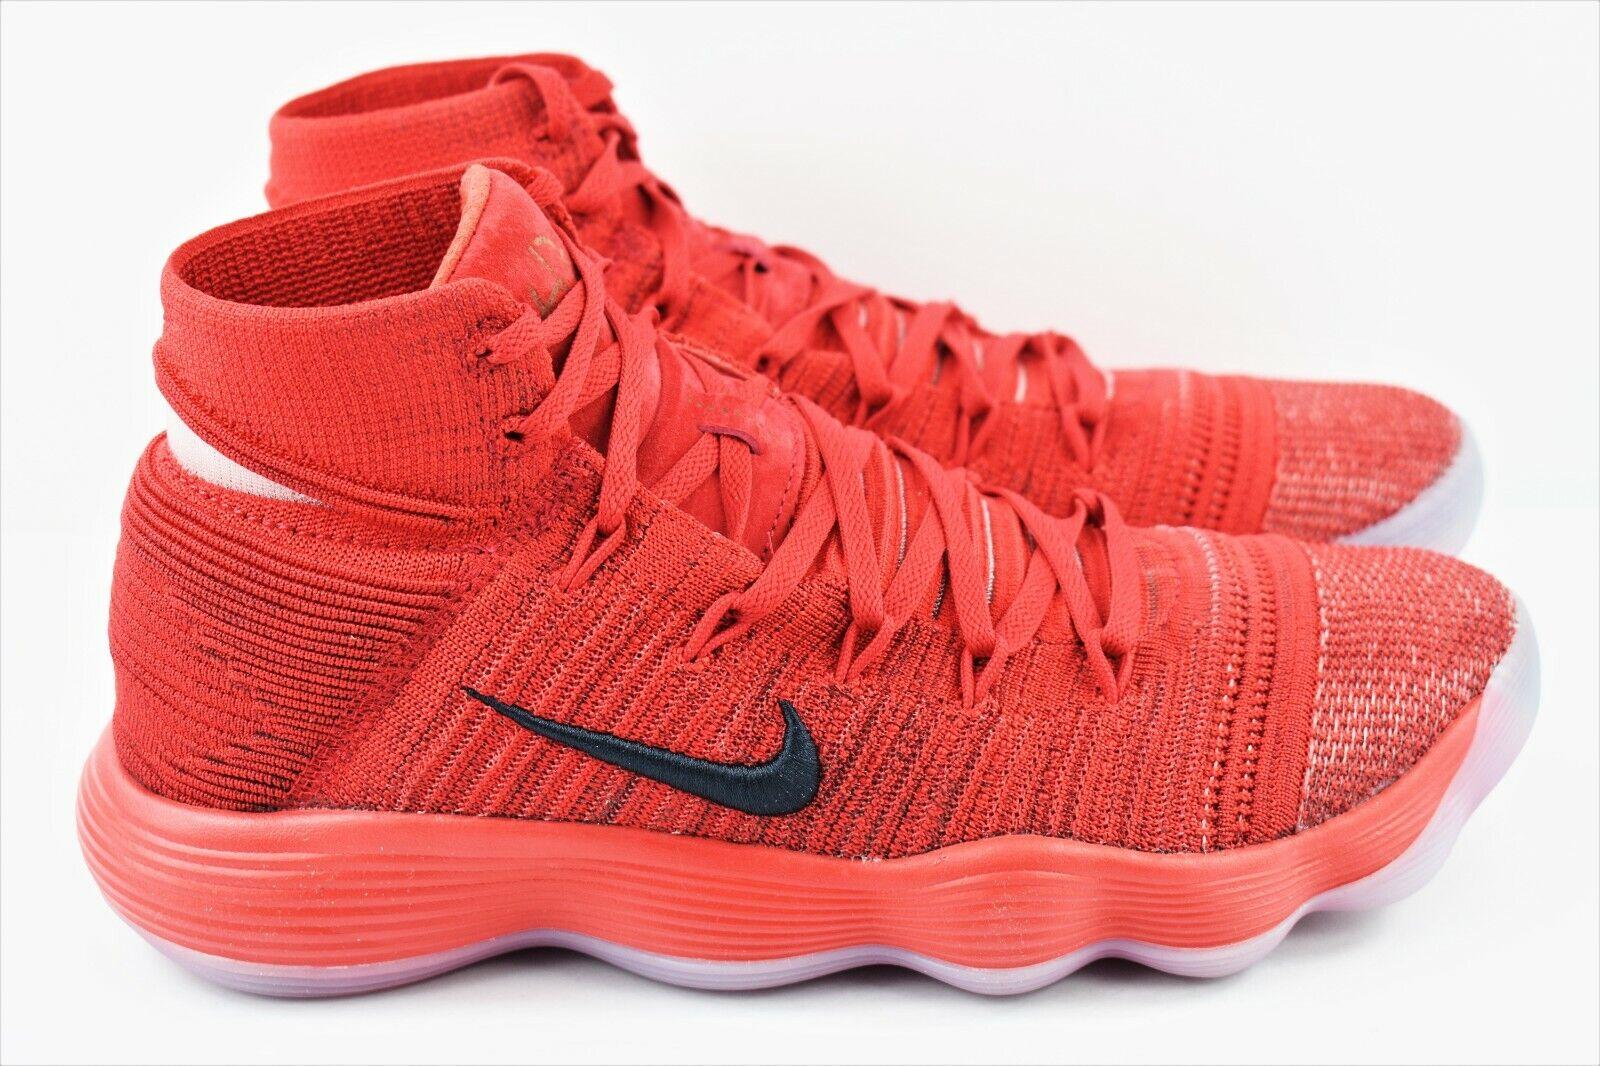 Nike Hyperdunk 2017 Flyknit Mens Multi Size Red Basketball shoes 917726 600